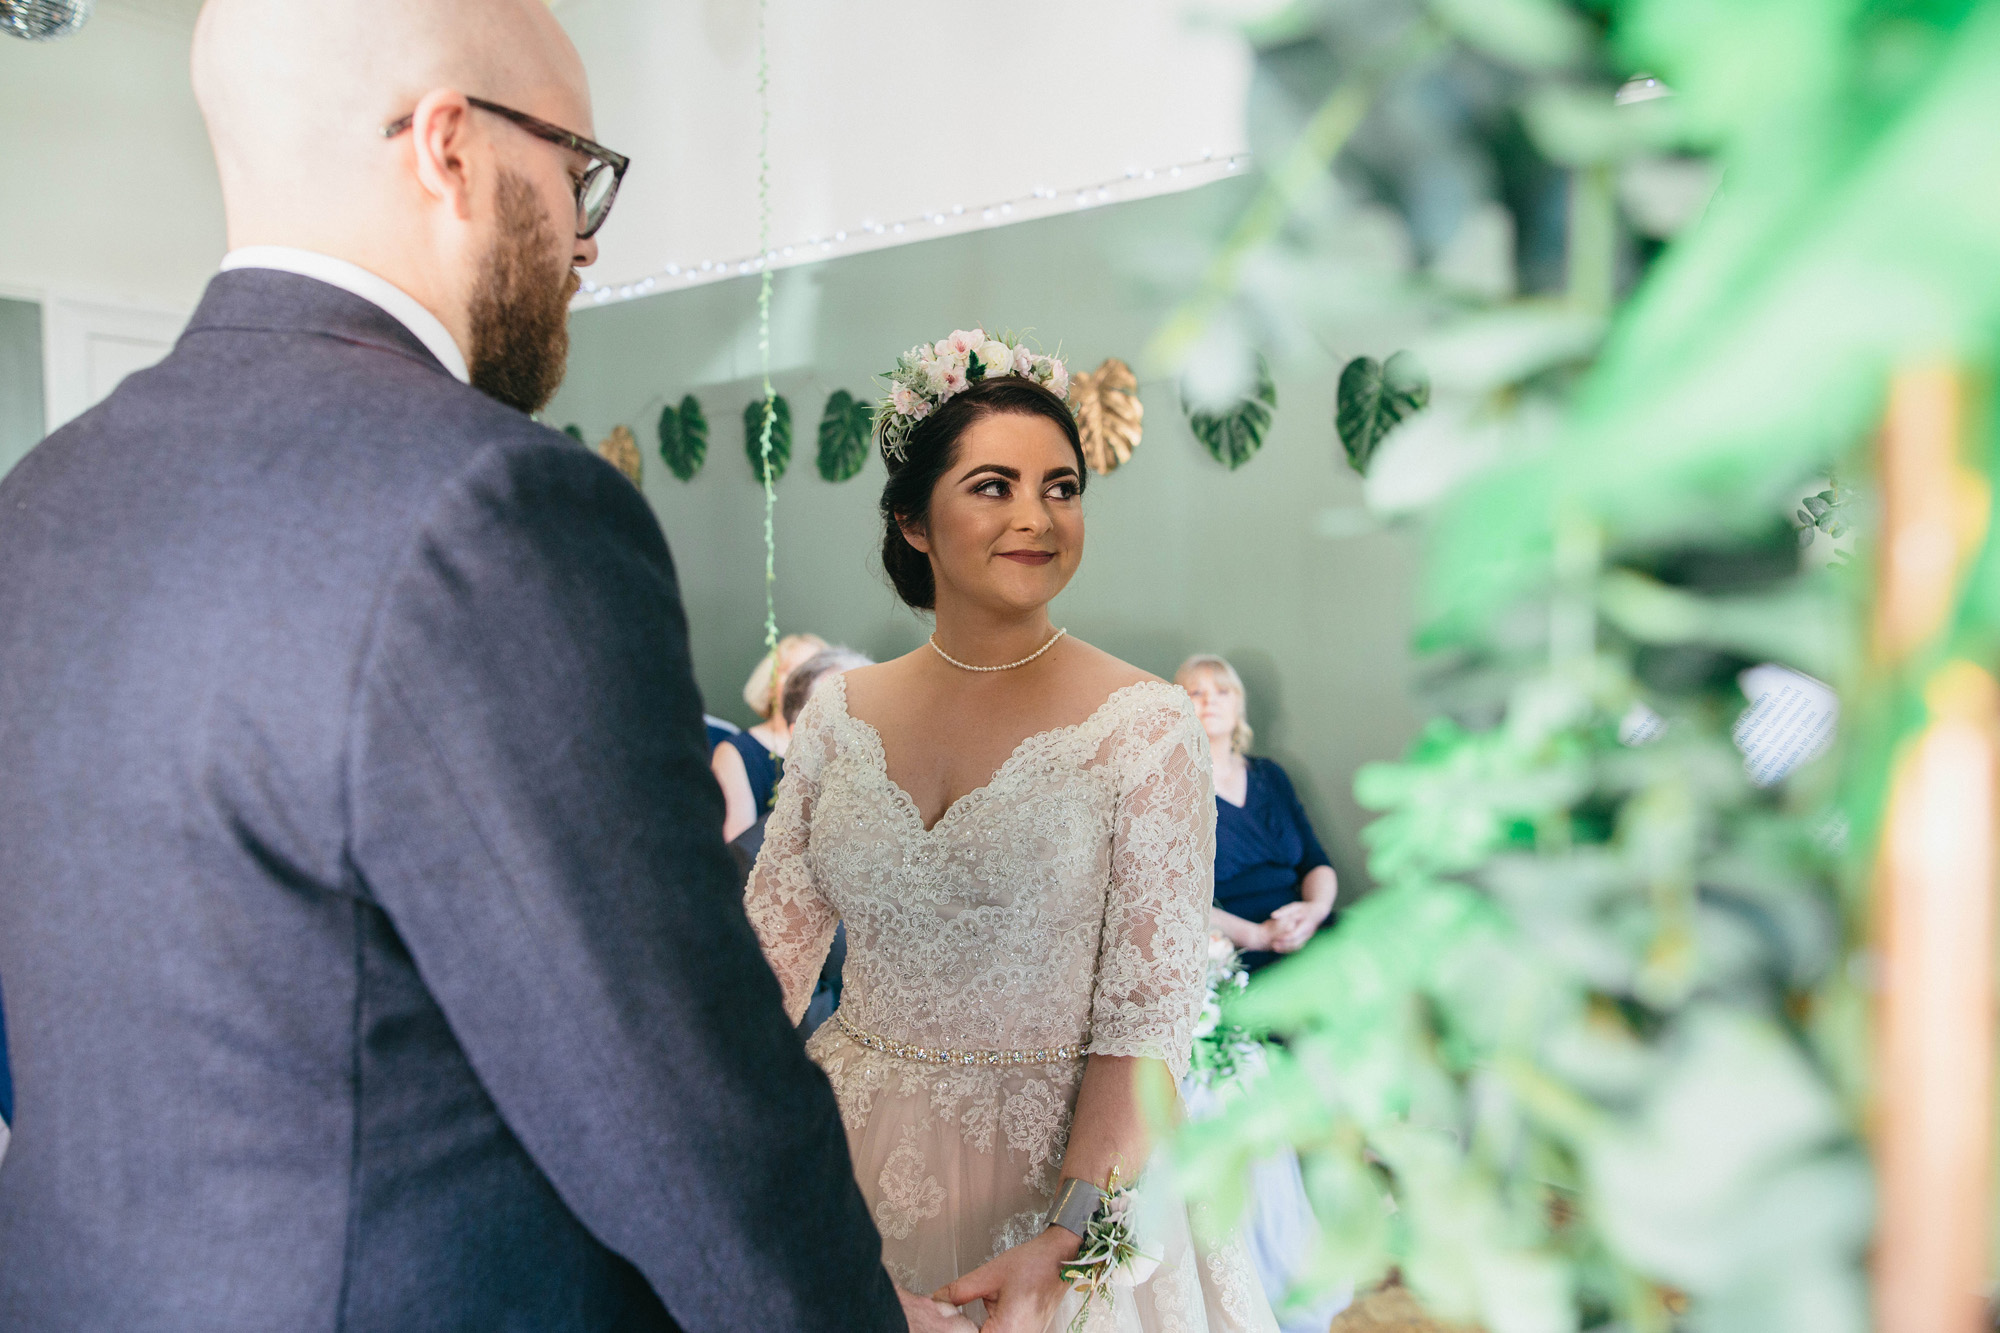 Quirky Wedding Photography Glasgow West End 025.jpg